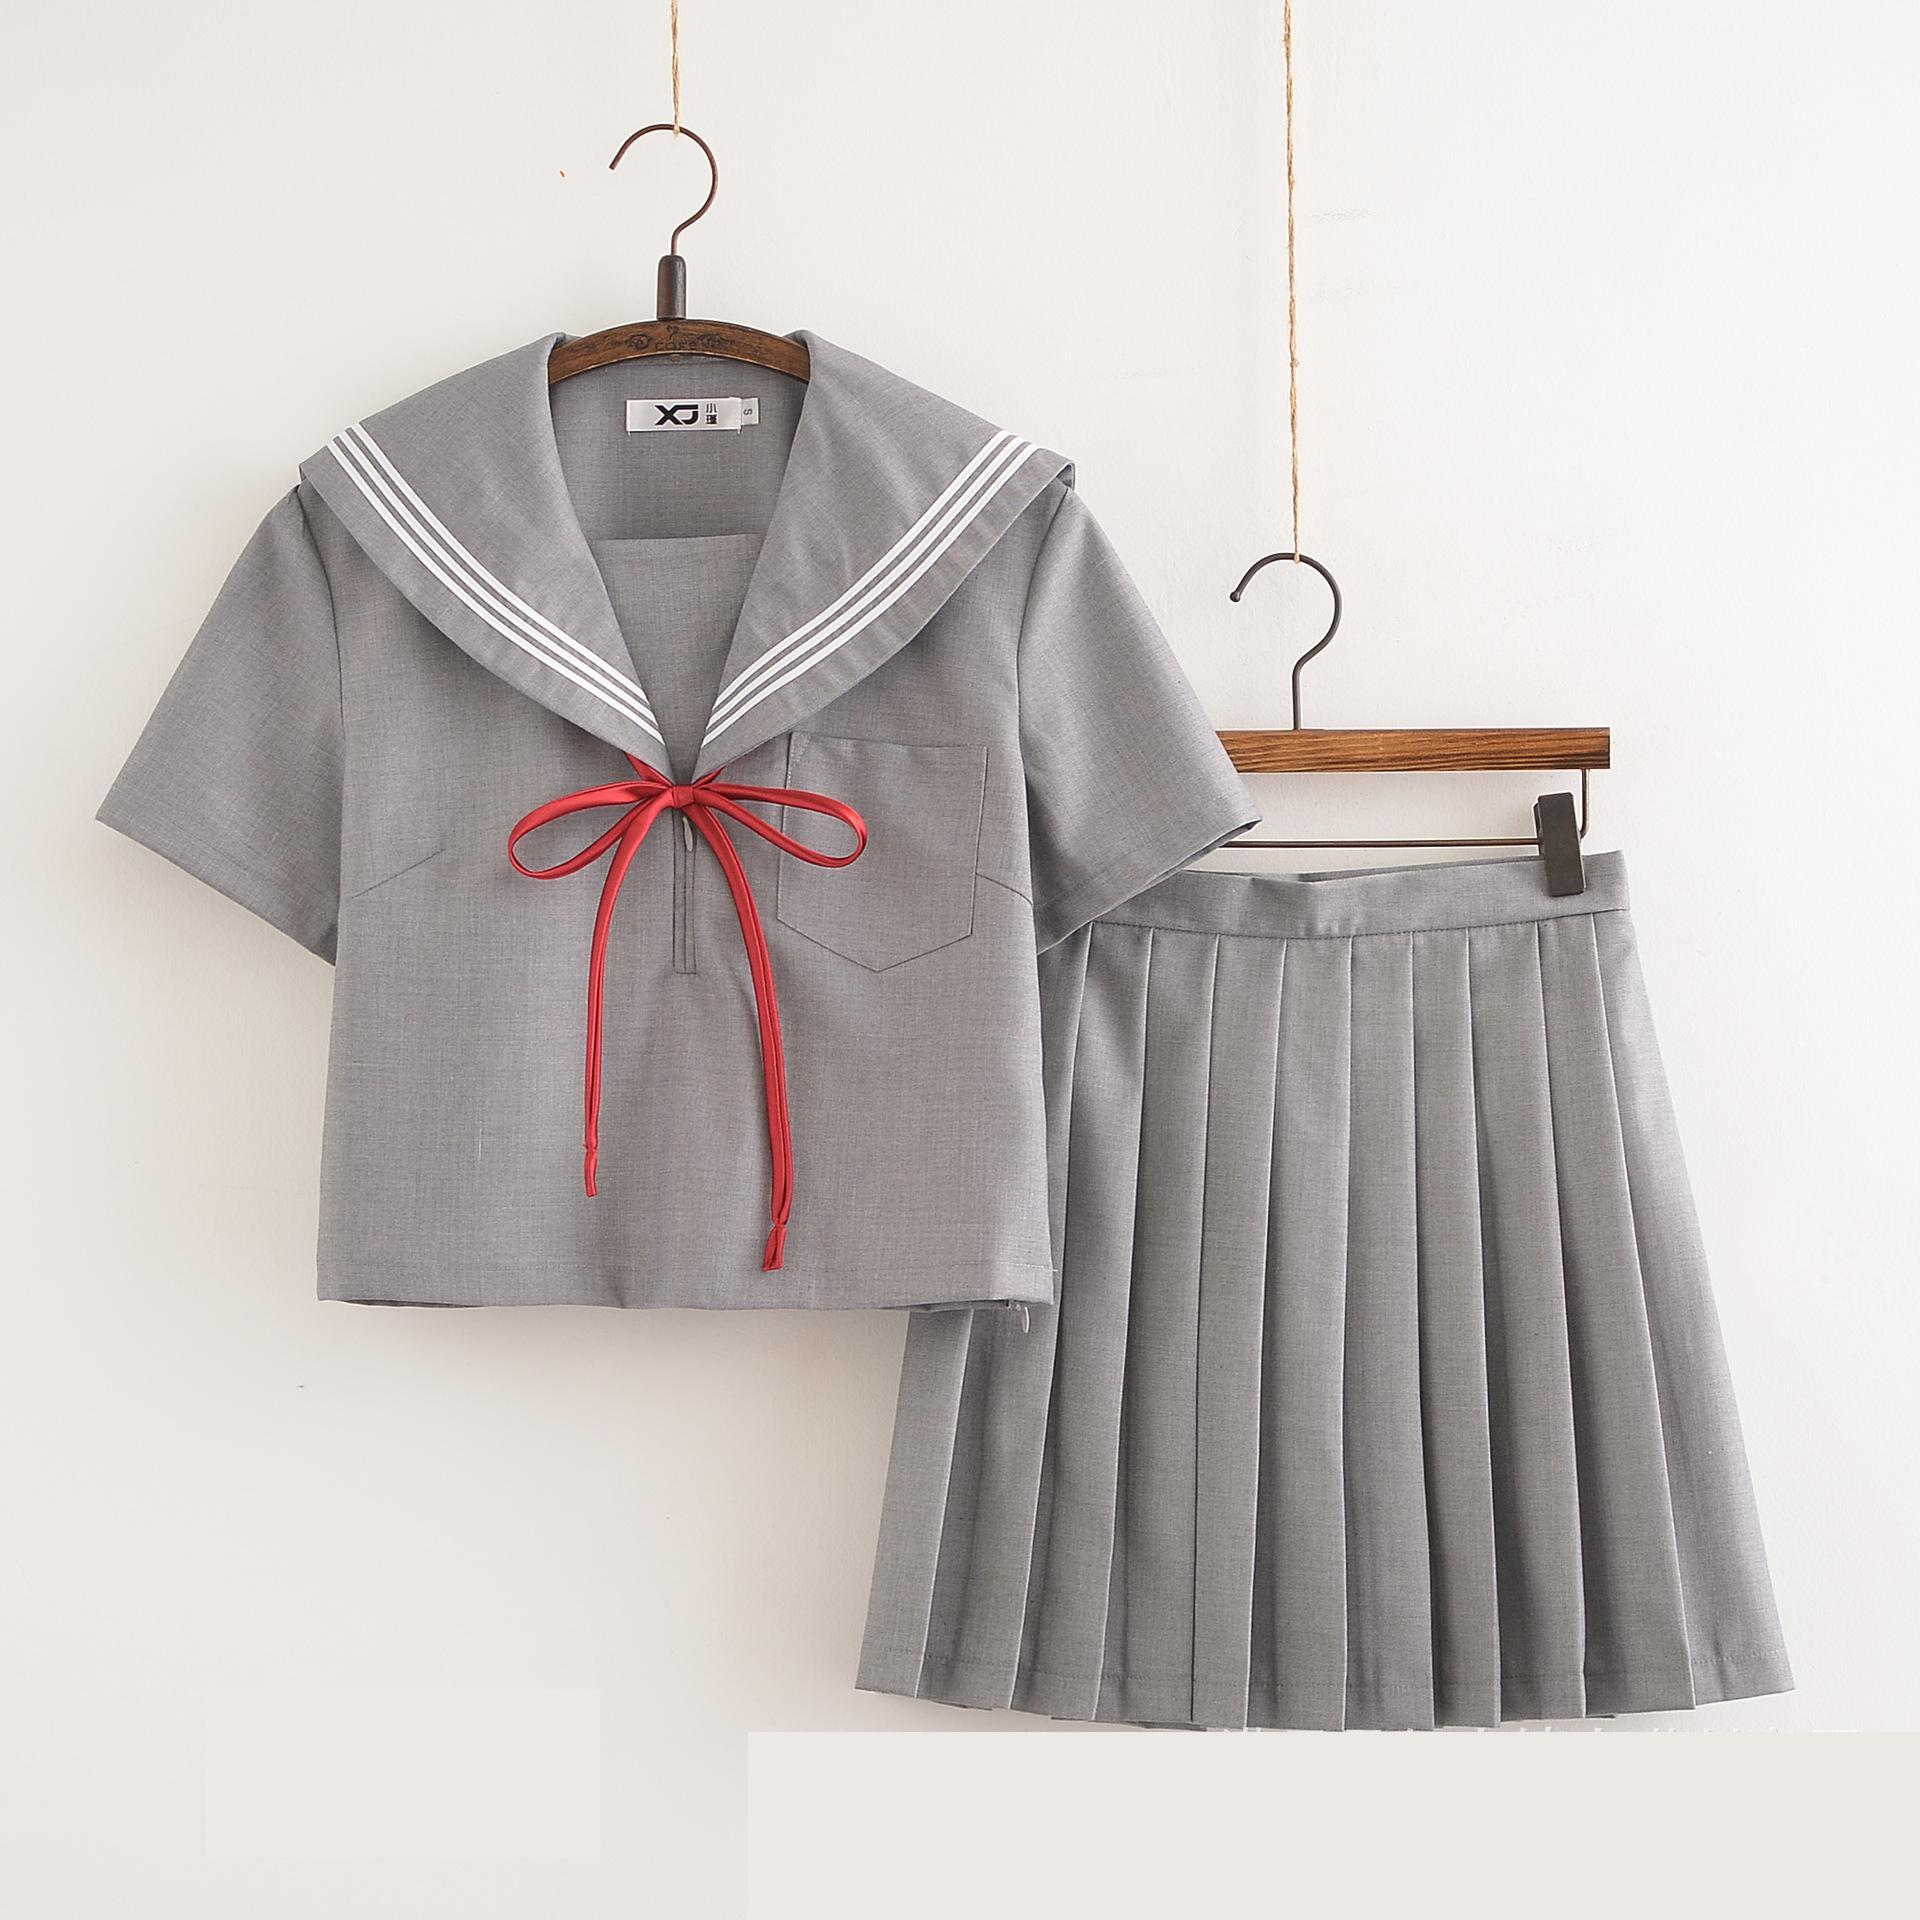 Traje de estudiantes japoneses de Corea, uniforme escolar para niña, Falda plisada de manga corta, traje de Color gris, ropa de Cosplay, uniforme marinero